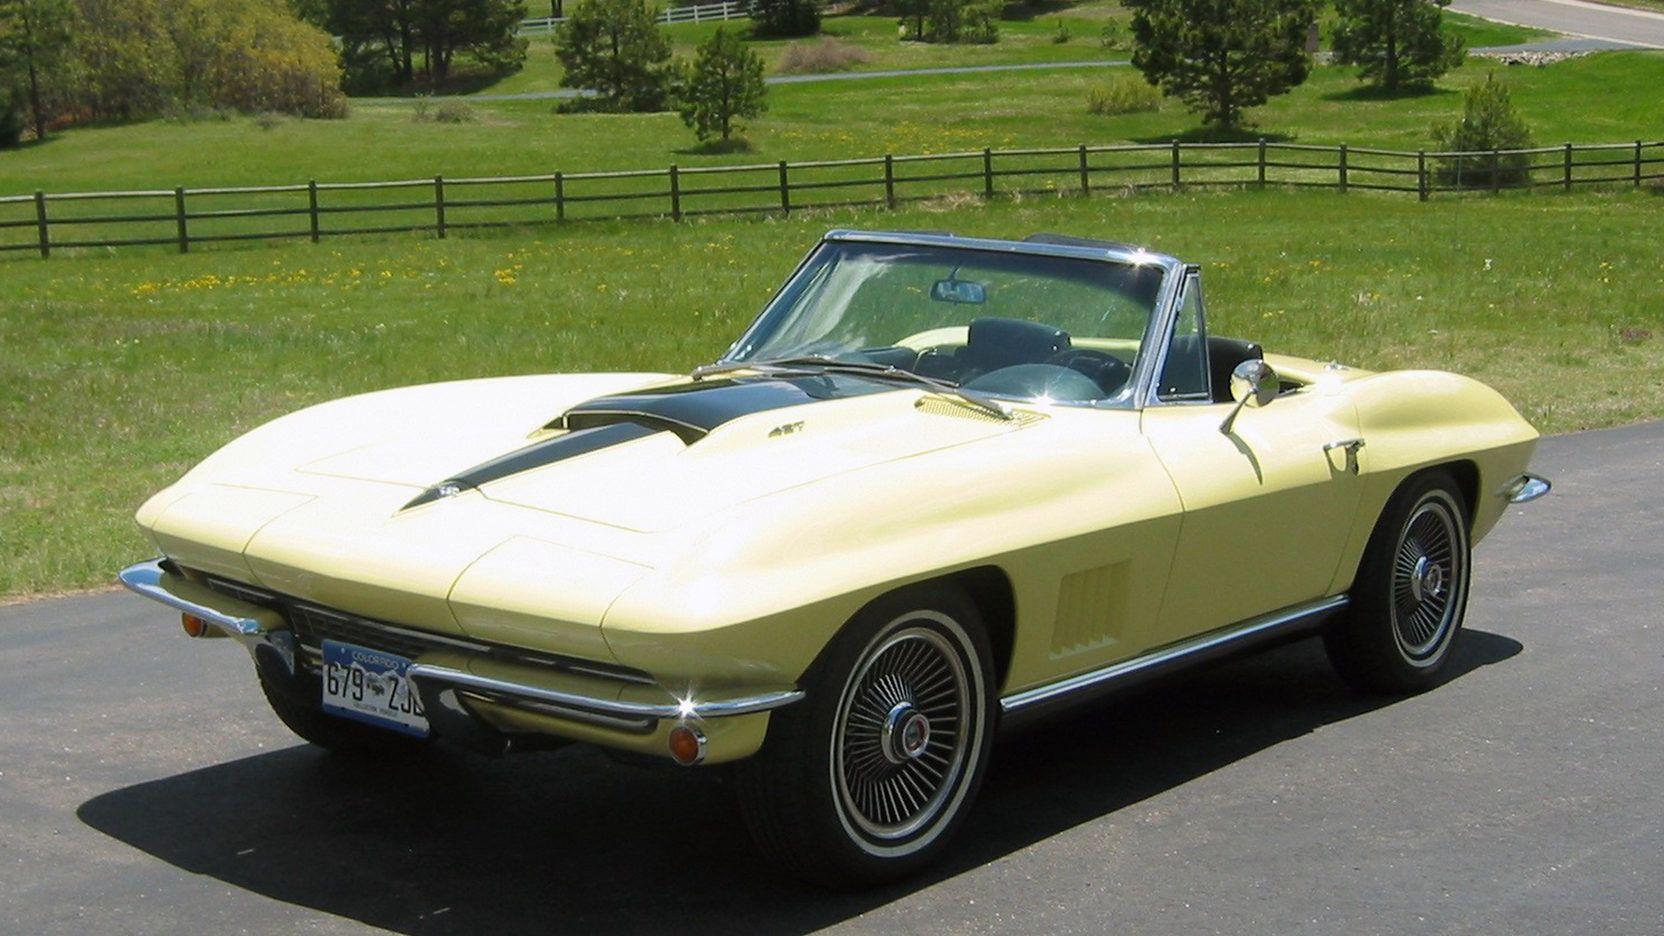 1967 Chevrolet Corvette Convertible 427/400 HP, 4Speed, 1